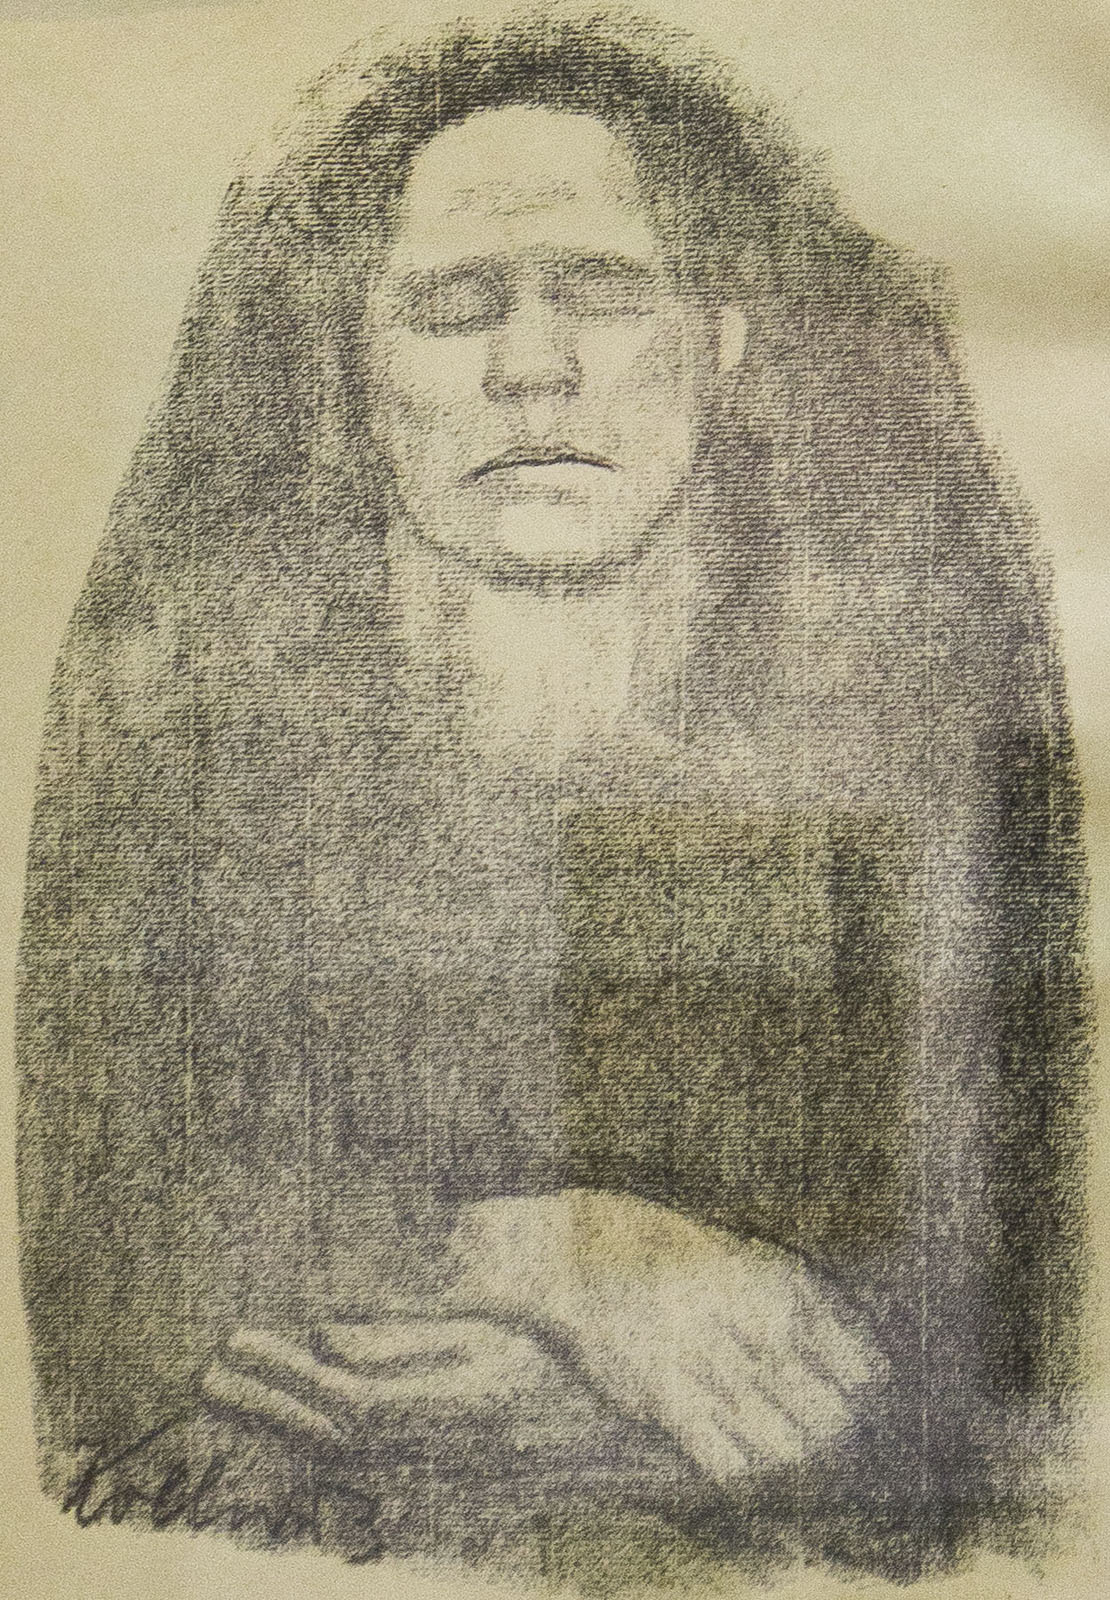 Фото №76682. Беспокойство. 1914. Кете Кольвиц (1867-1945)